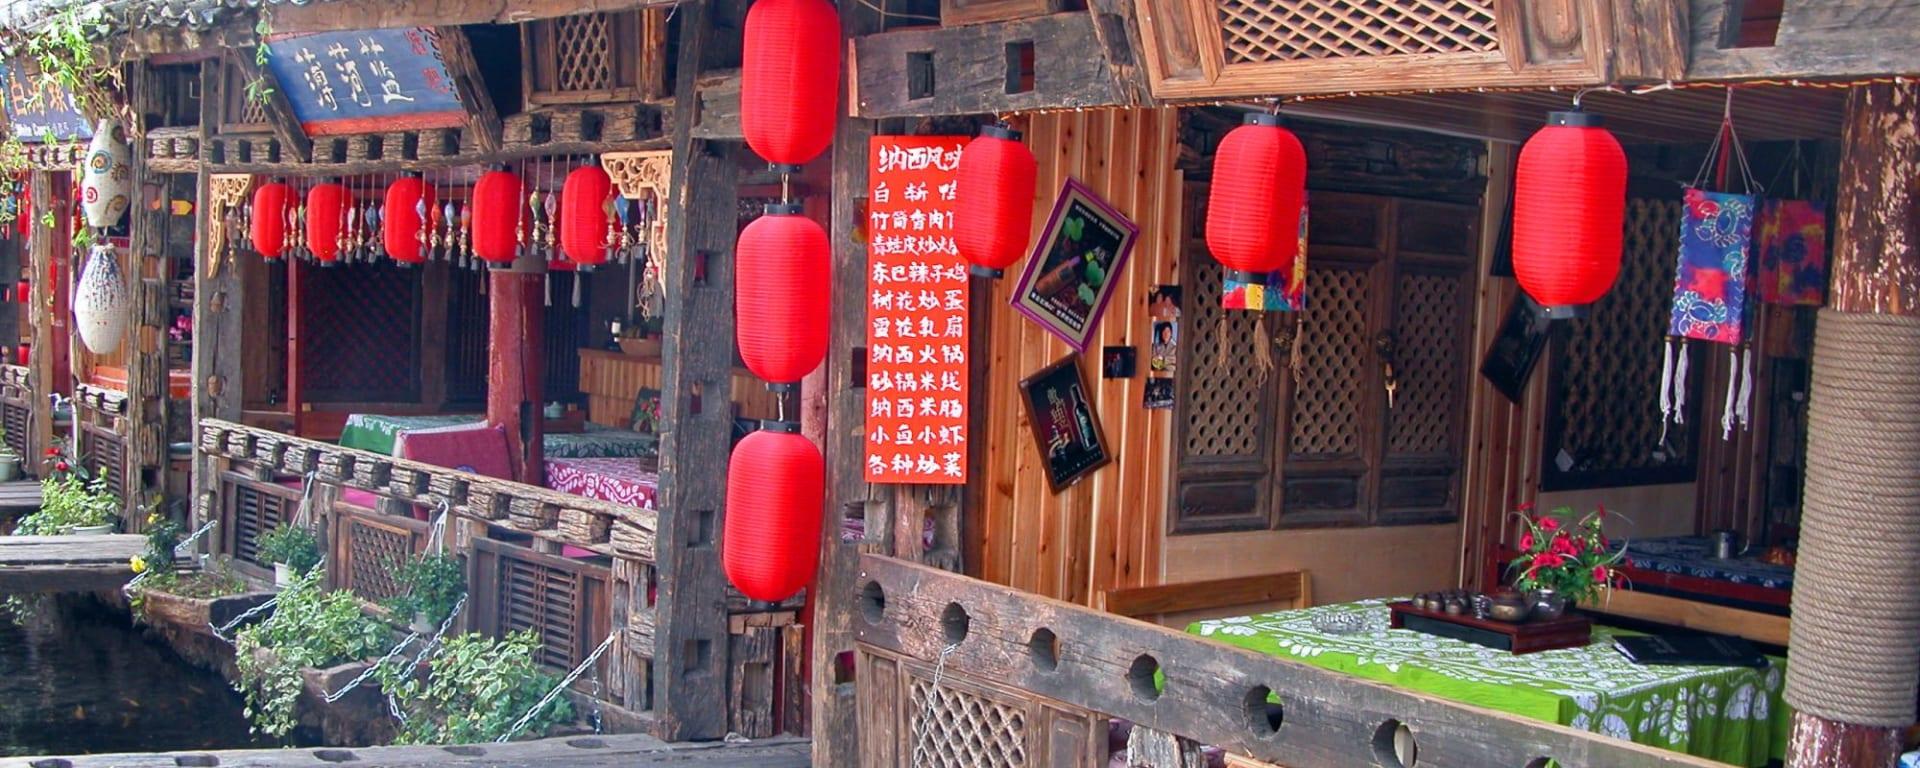 Découverte active du Yunnan de Kunming: Lijiang: Old Town